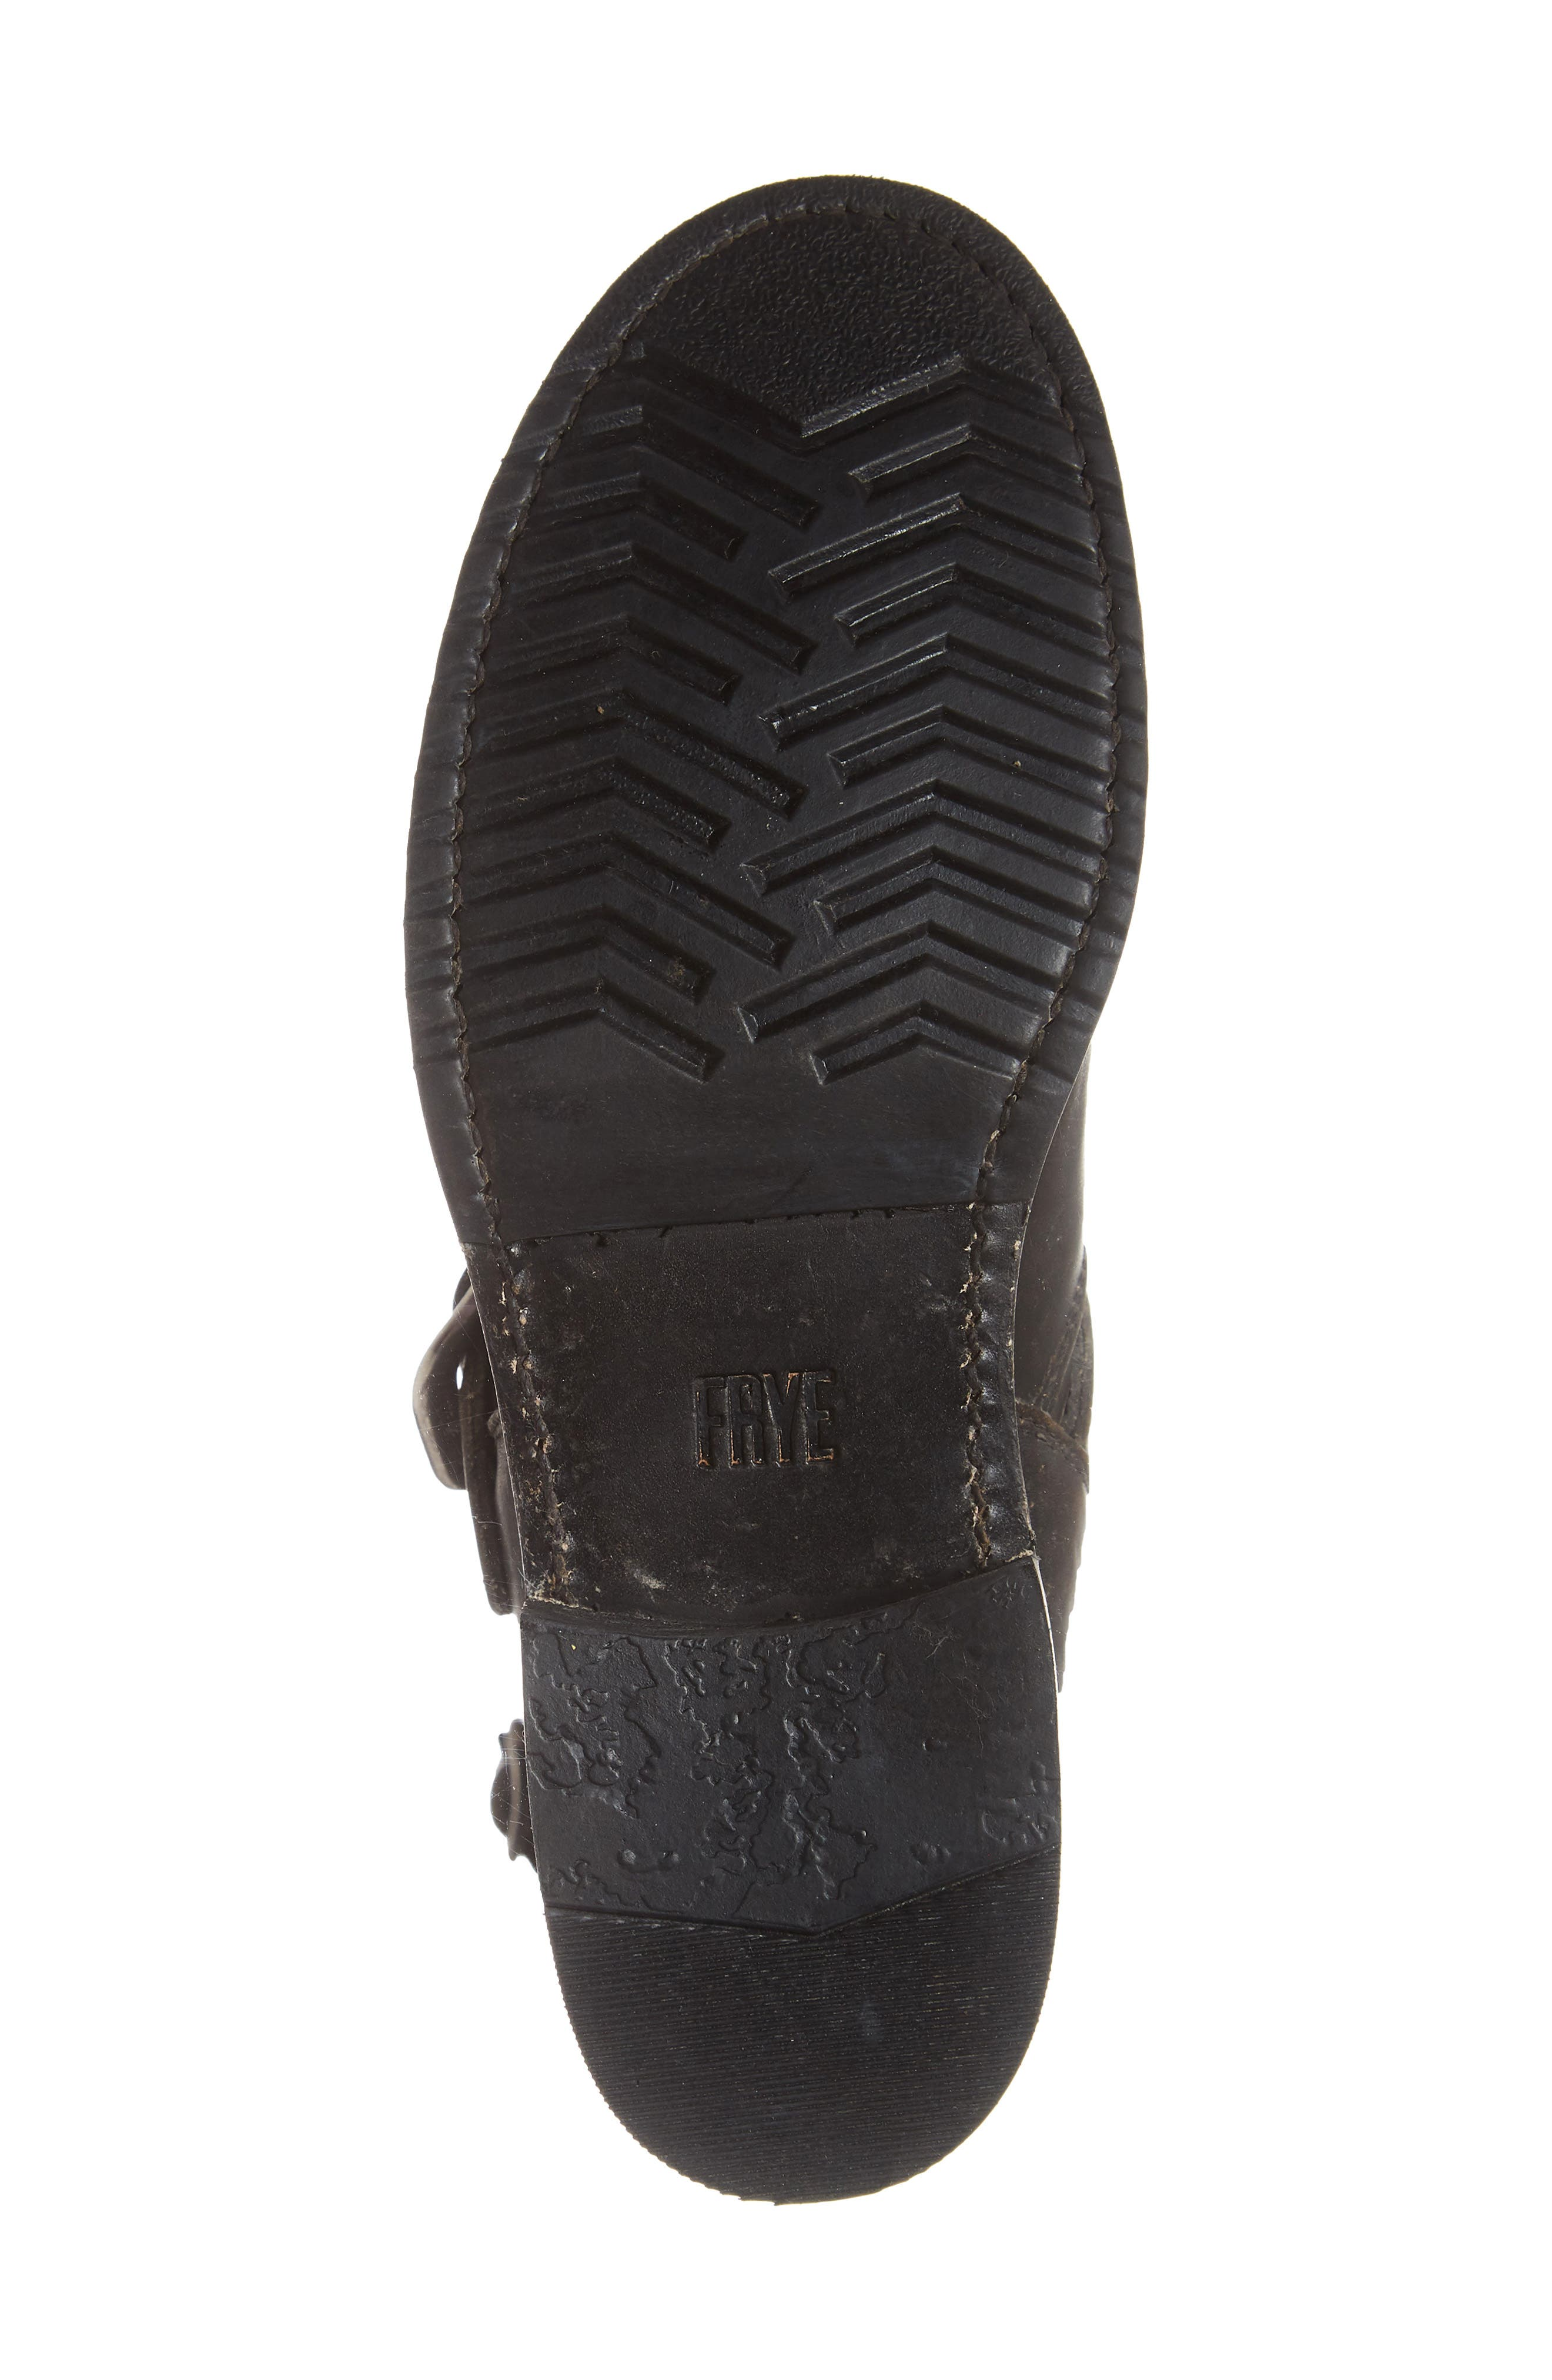 FRYE, 'Veronica' Short Boot, Alternate thumbnail 6, color, BLACK BRUSH OFF LEATHER